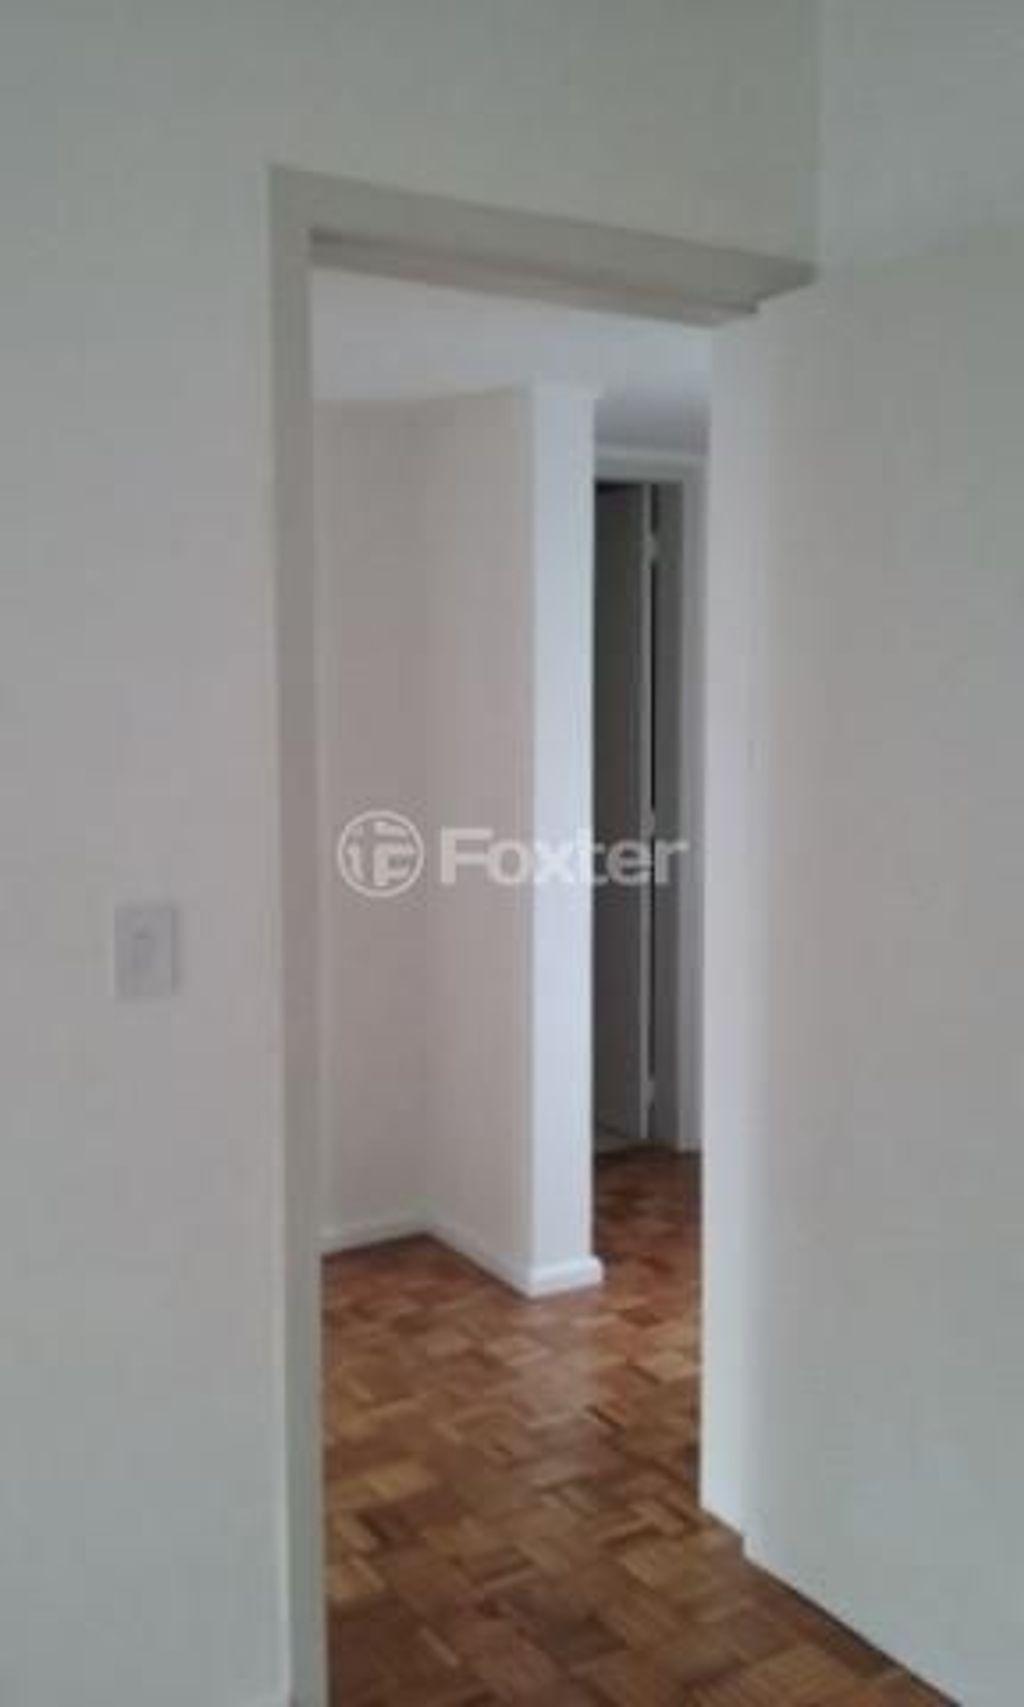 Apto 2 Dorm, Farroupilha, Porto Alegre (141819) - Foto 24